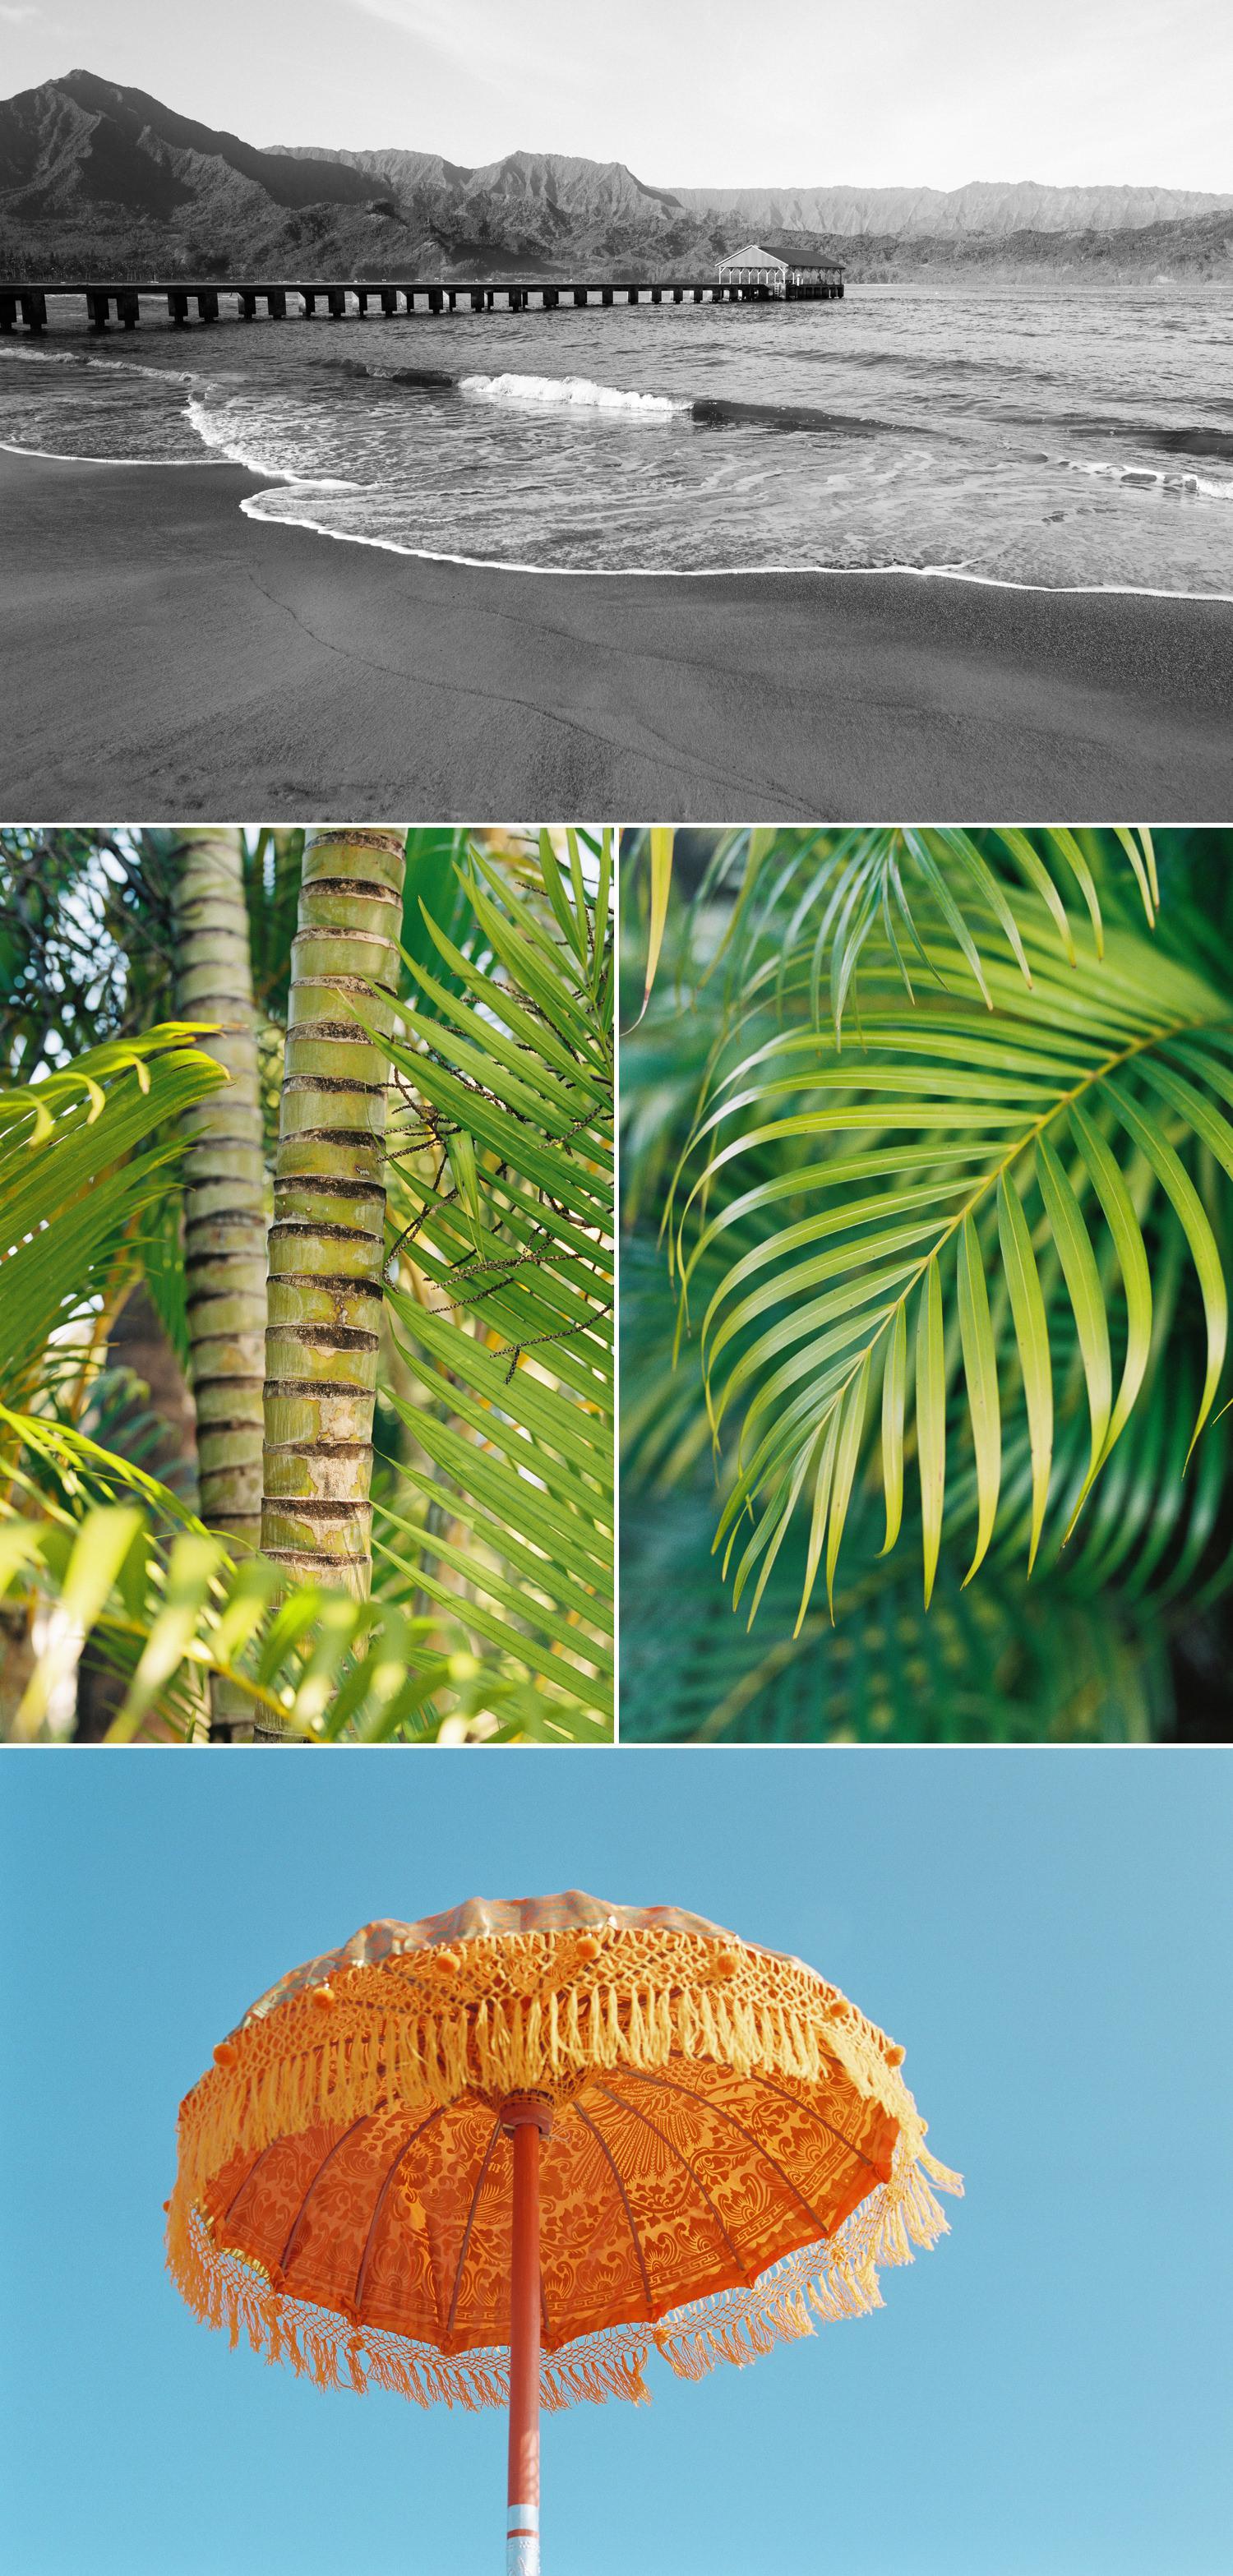 cameron-zegers-photography-travel-hawaii-kauai-20.jpg